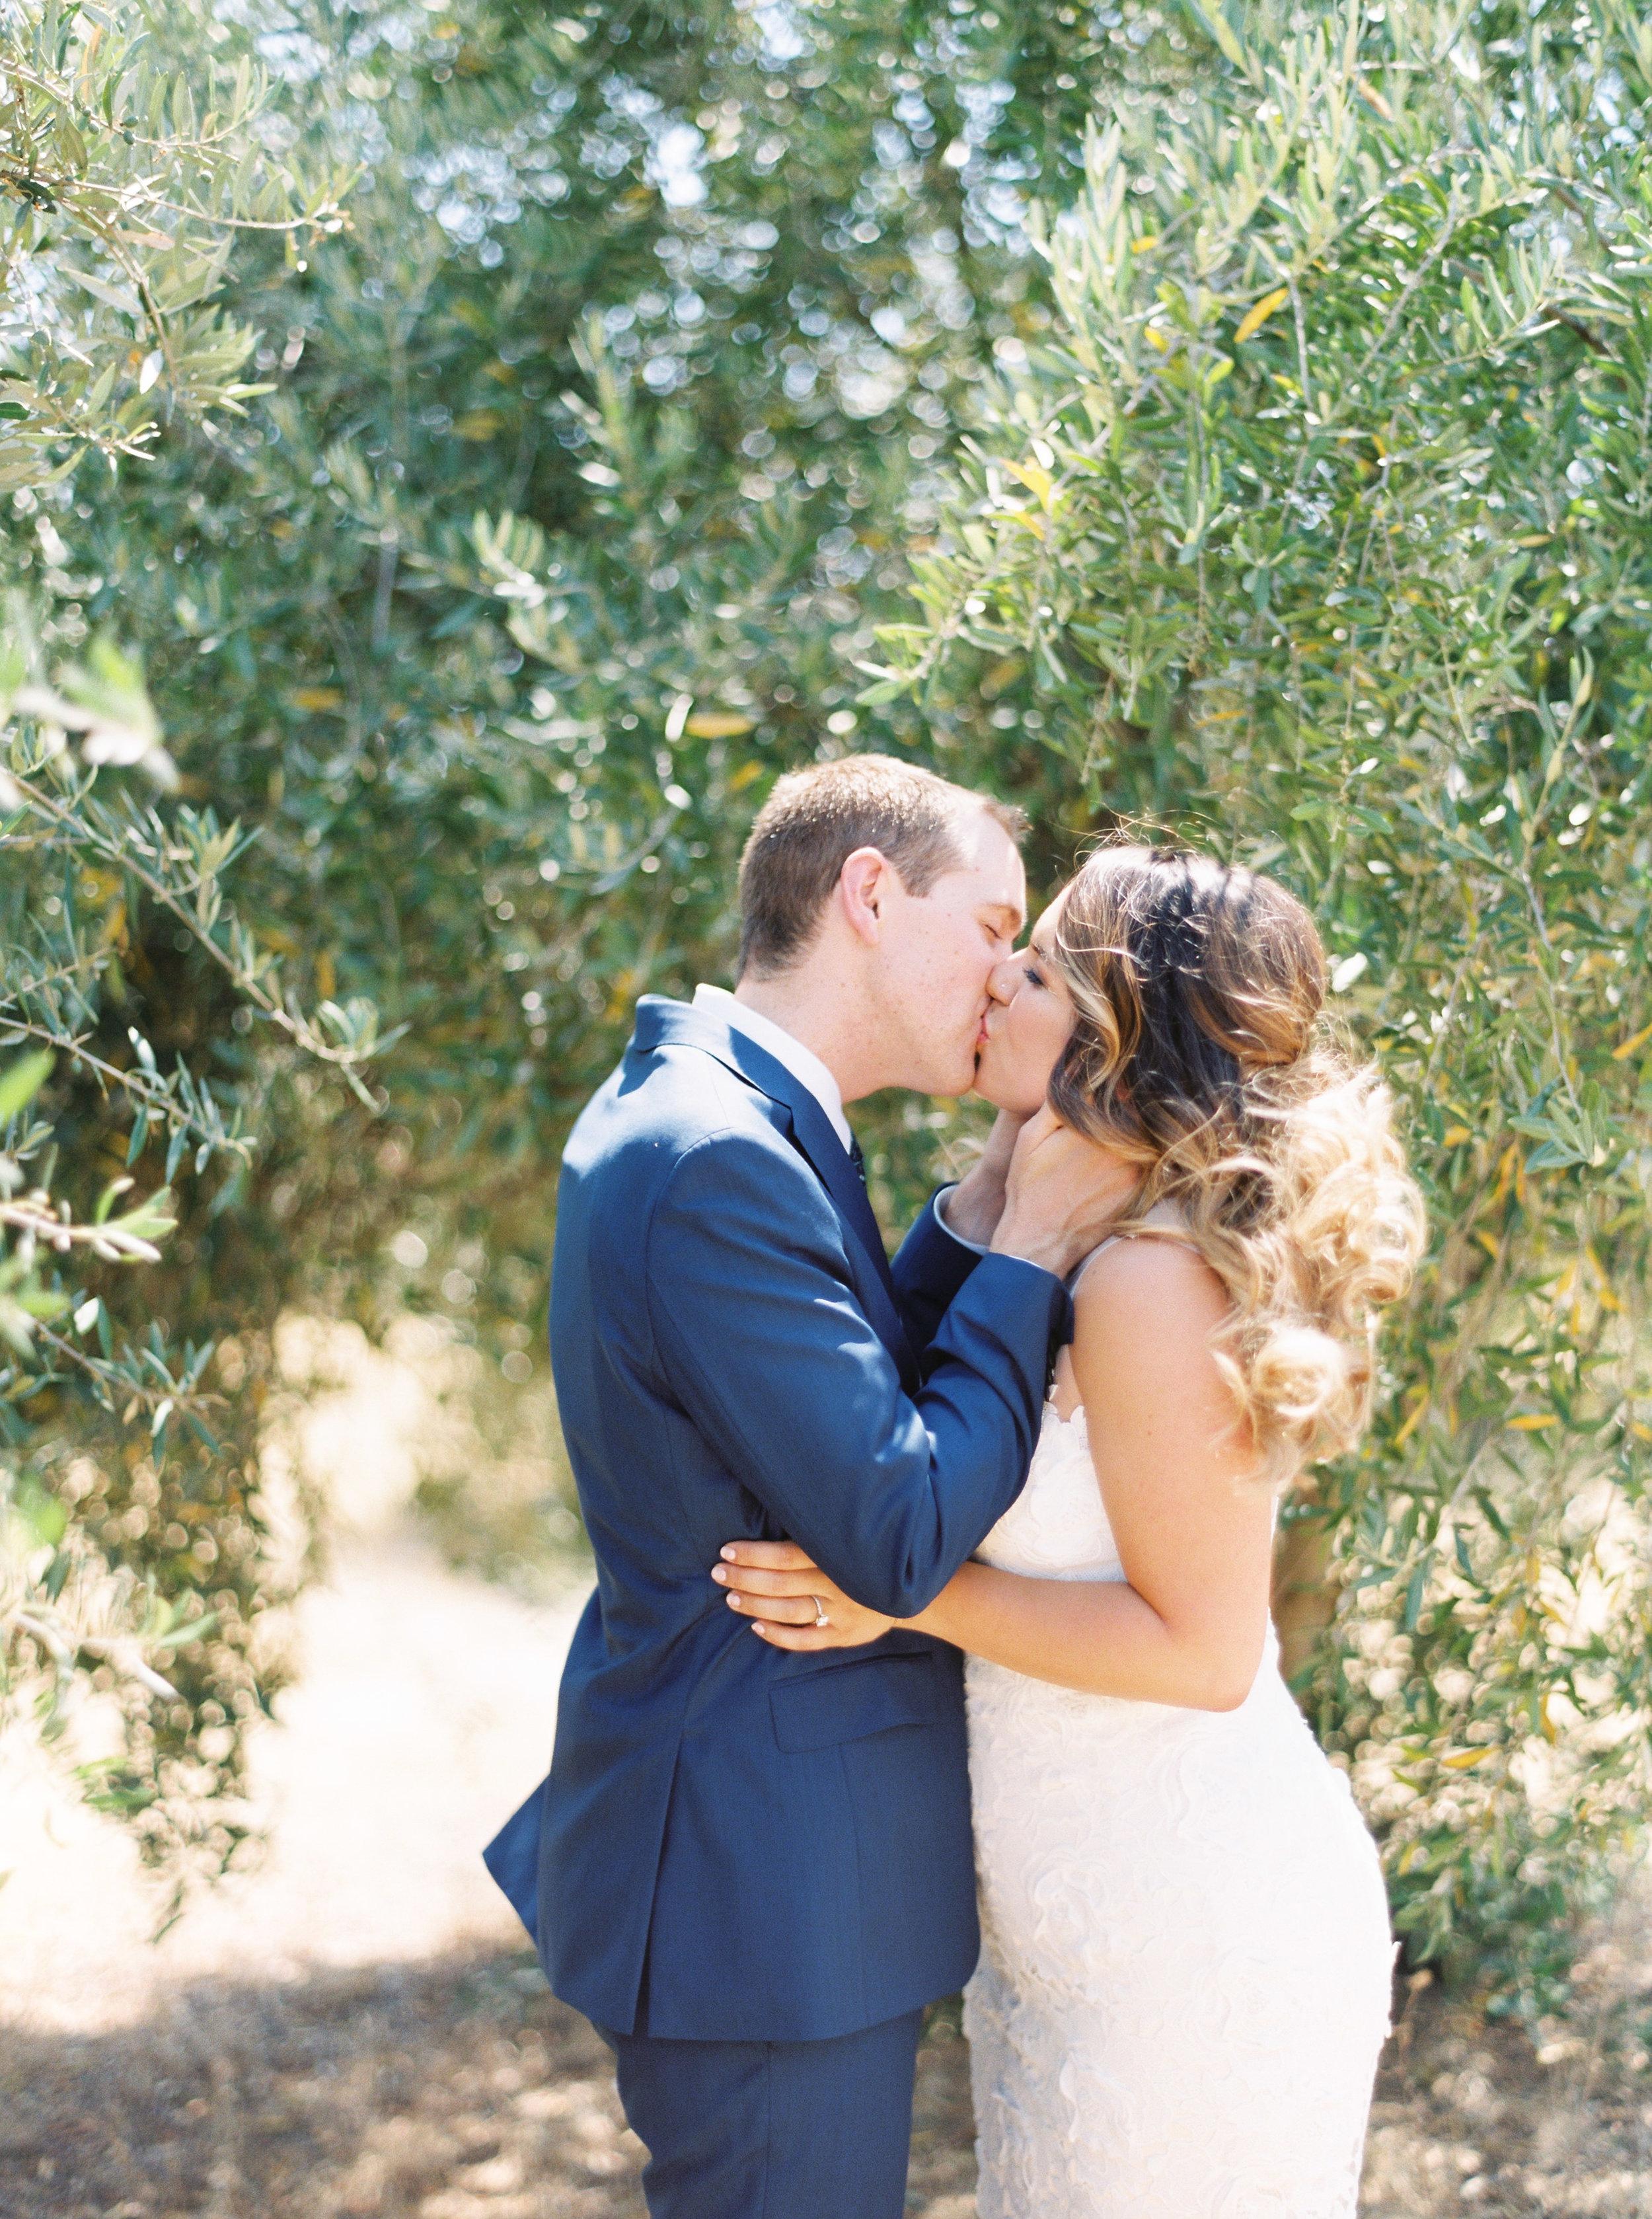 the-purple-orchid-resort-wedding-in-livermore-california-220.jpg